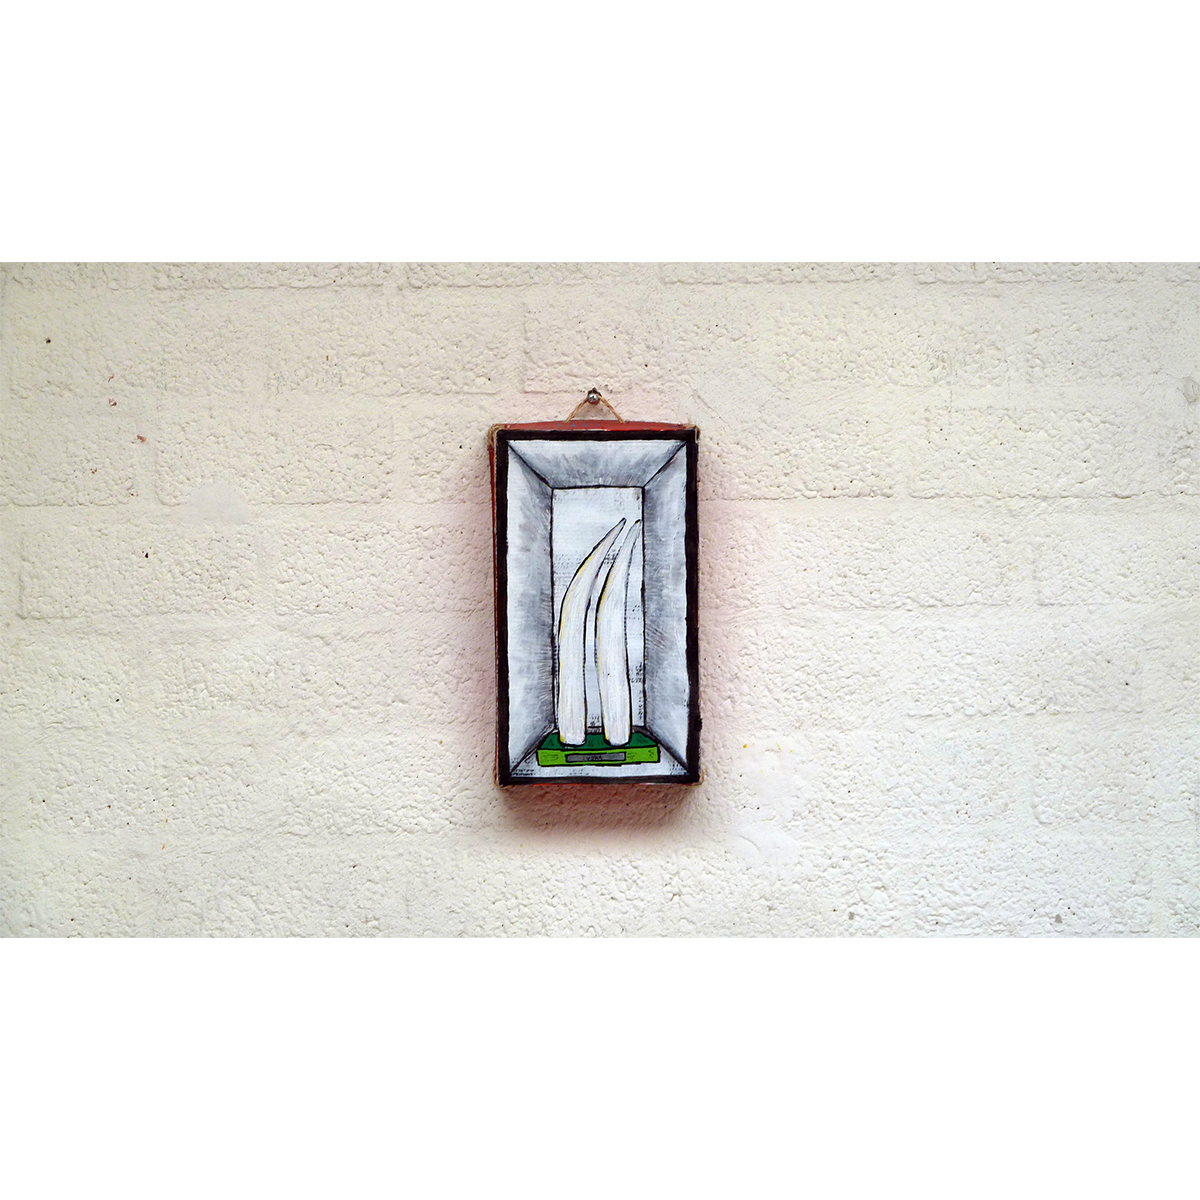 BOX (04) 'IVORY' 02 - Frank Willems